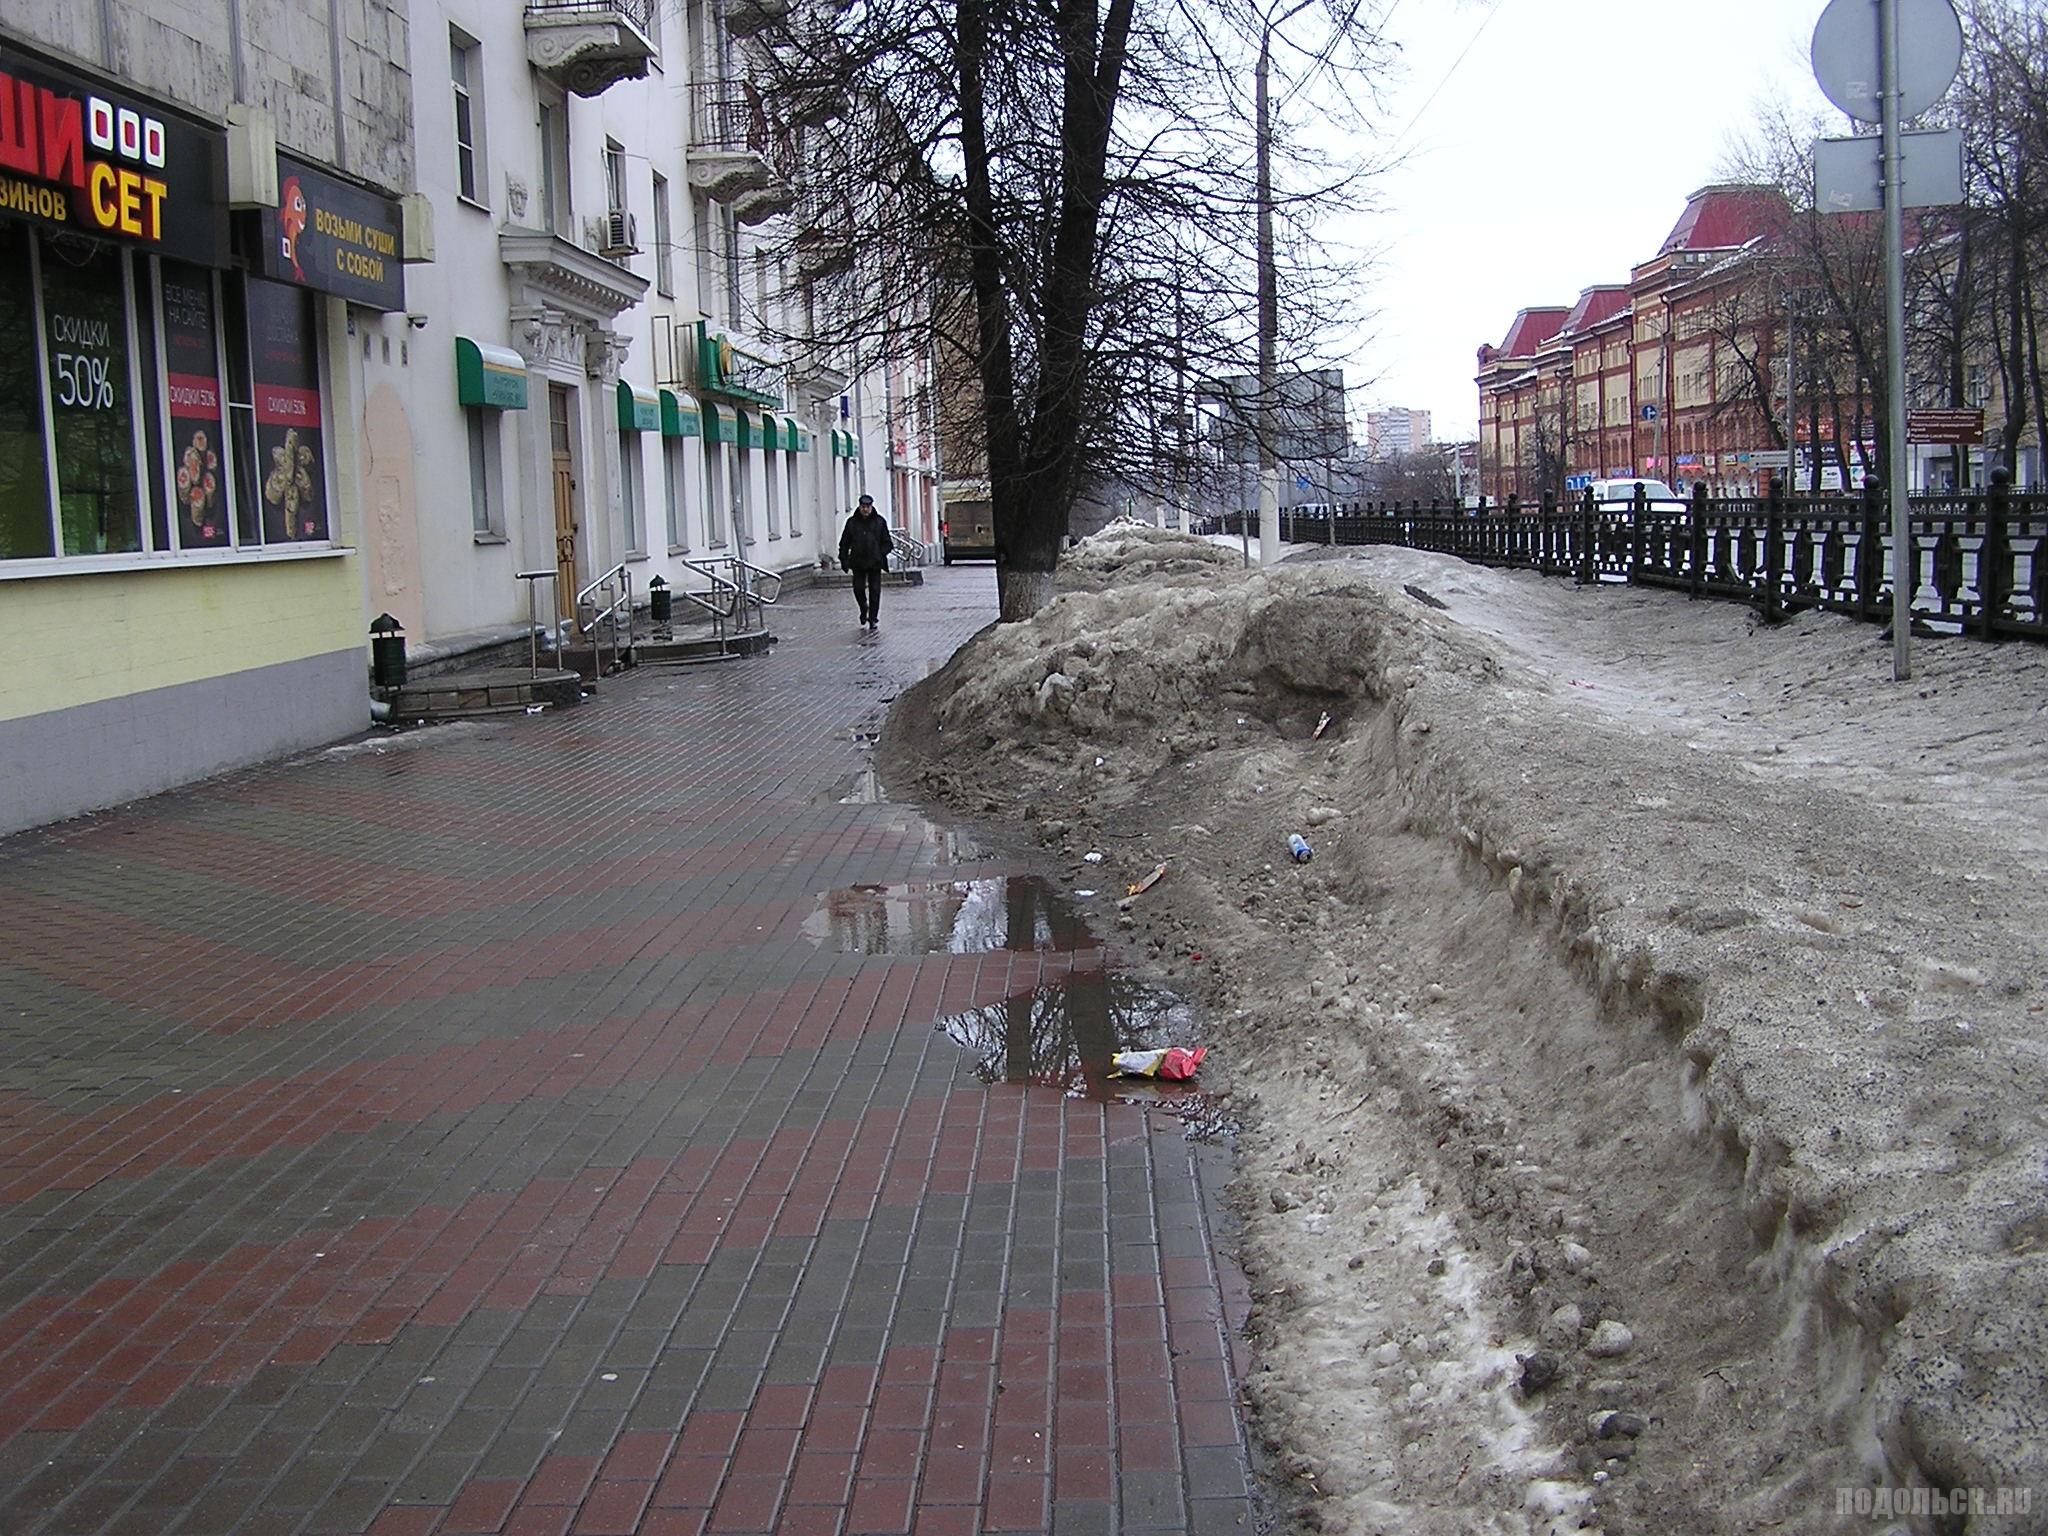 Проспект Ленина у Дома книги. 18.02.17.